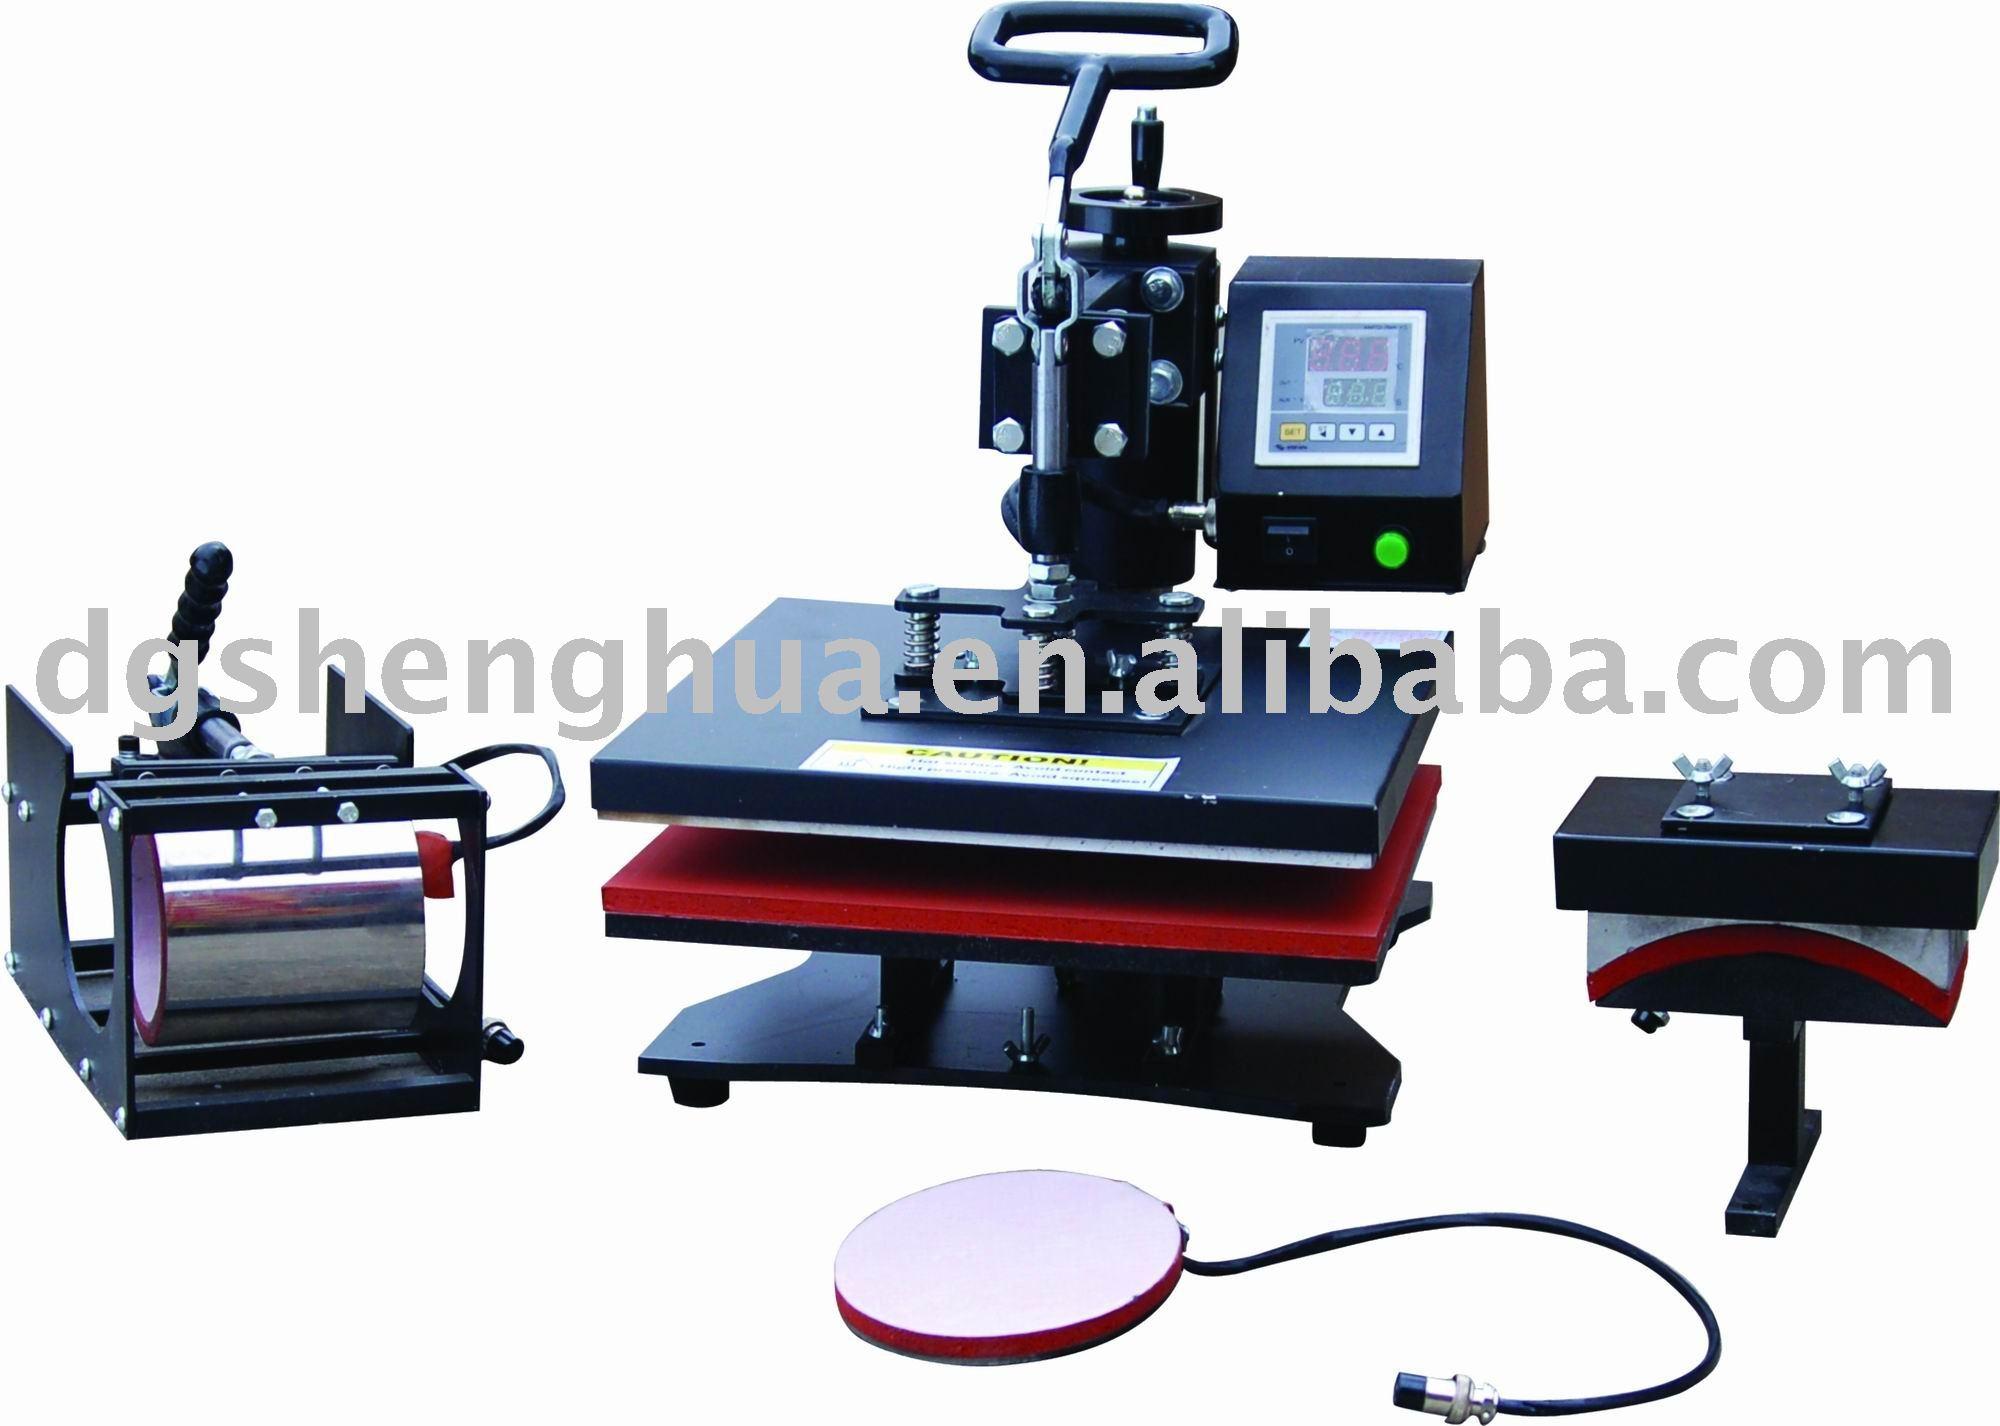 dgshenghua.en.alibaba.com